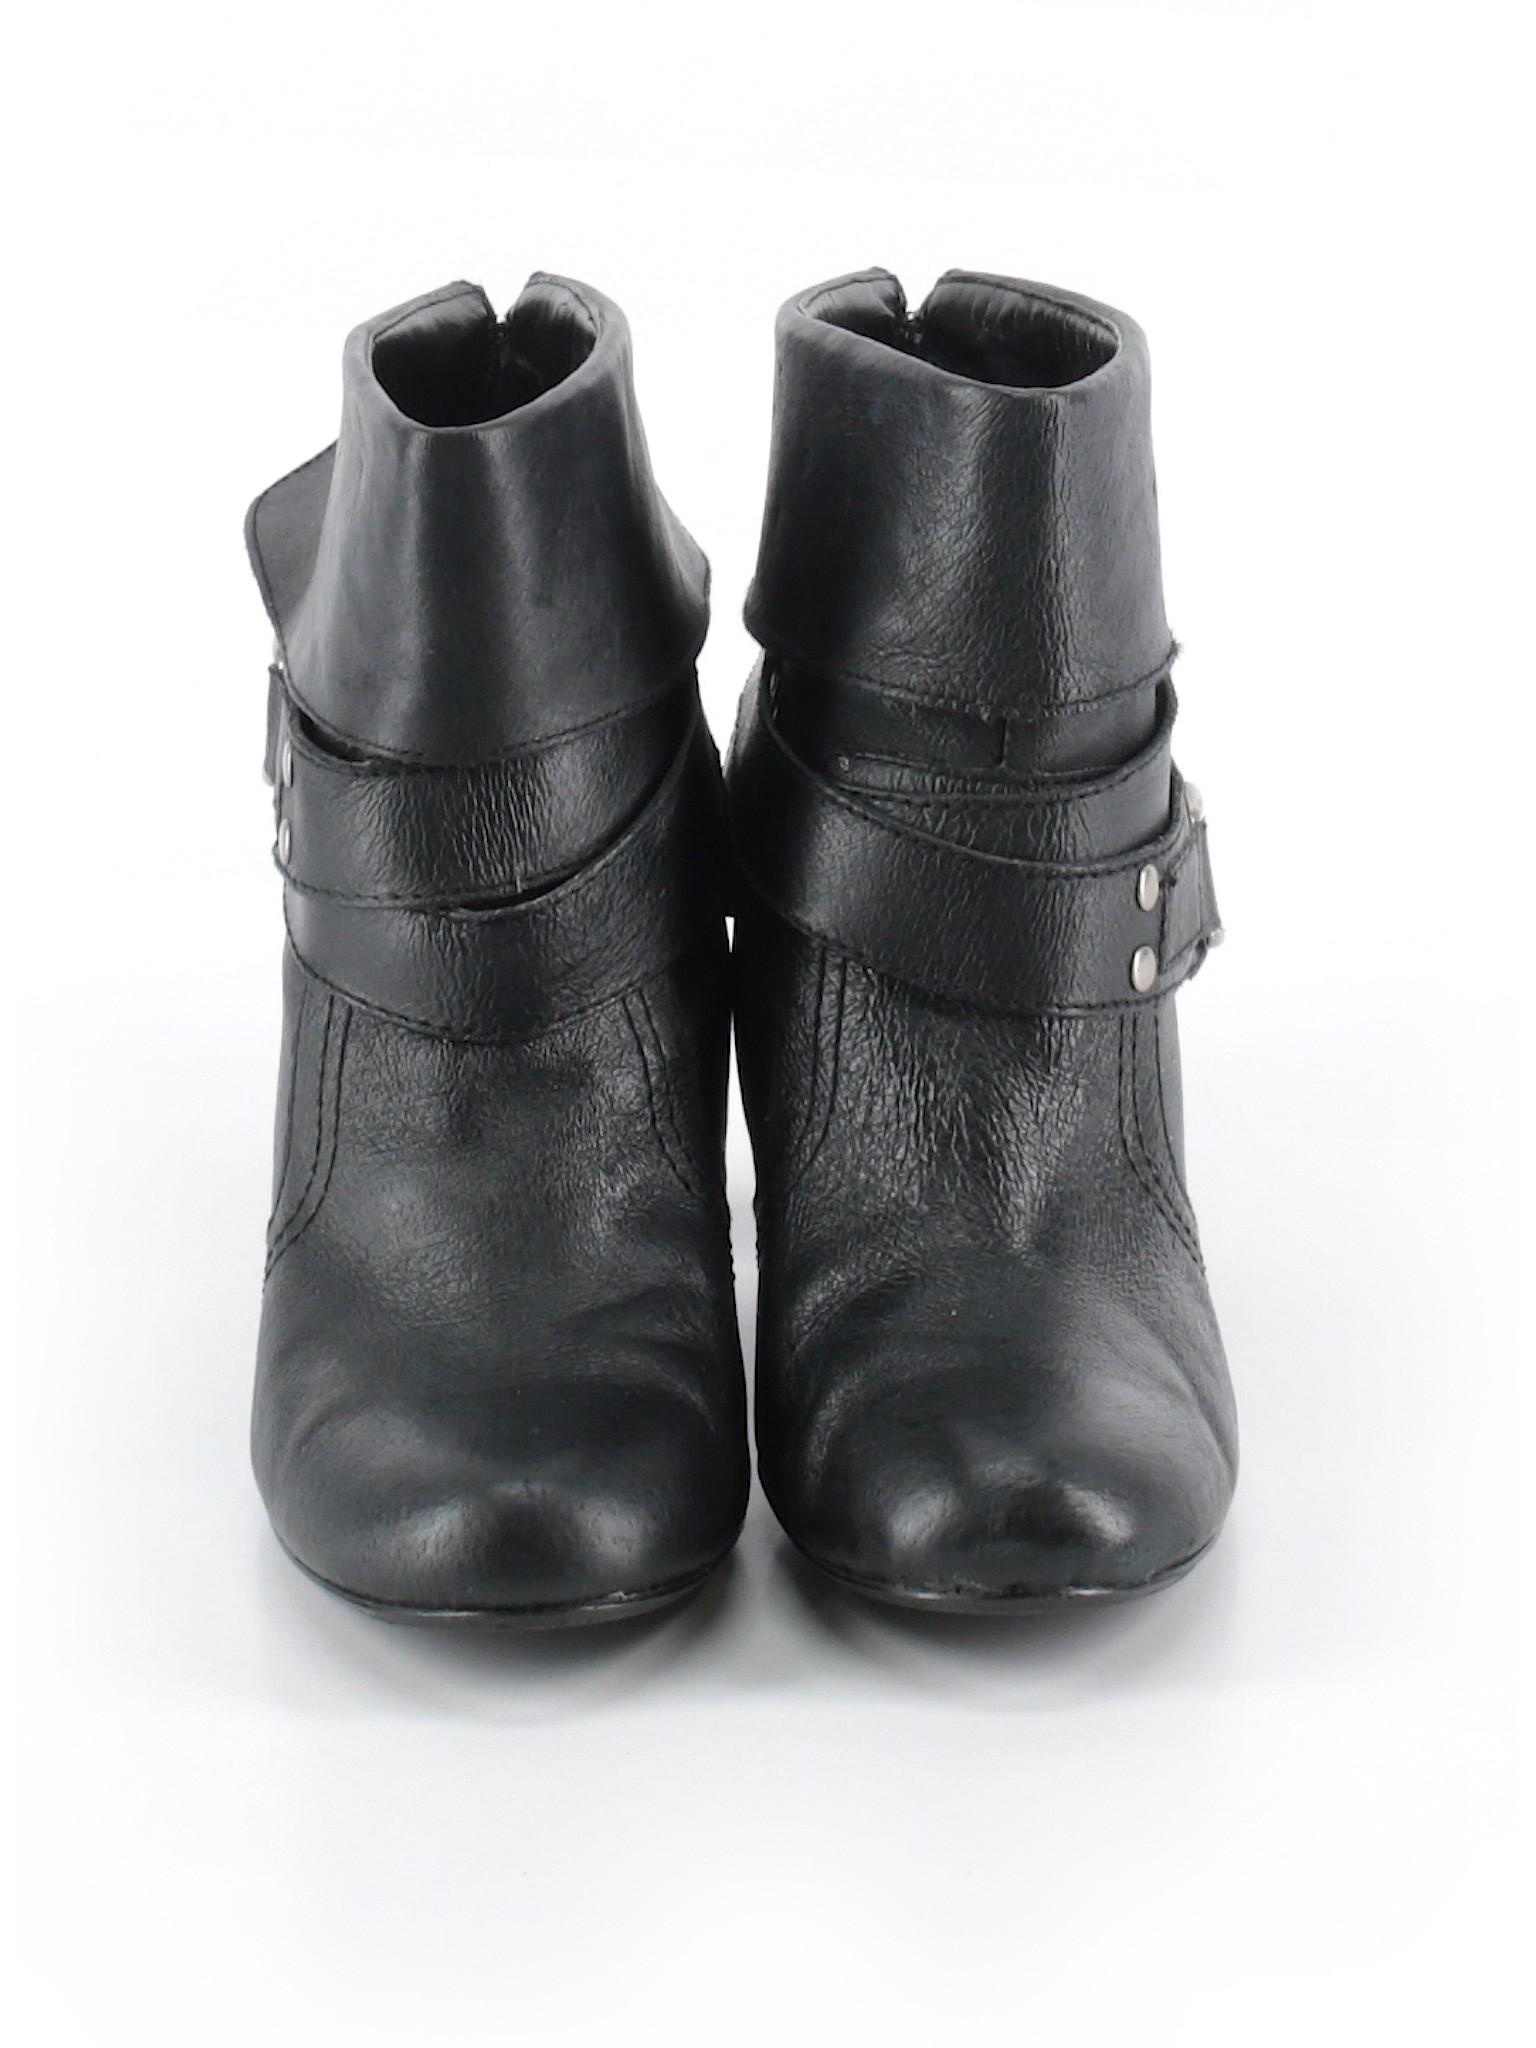 amp; Katie promotion Boots Kelly Ankle Boutique 7UFxwS